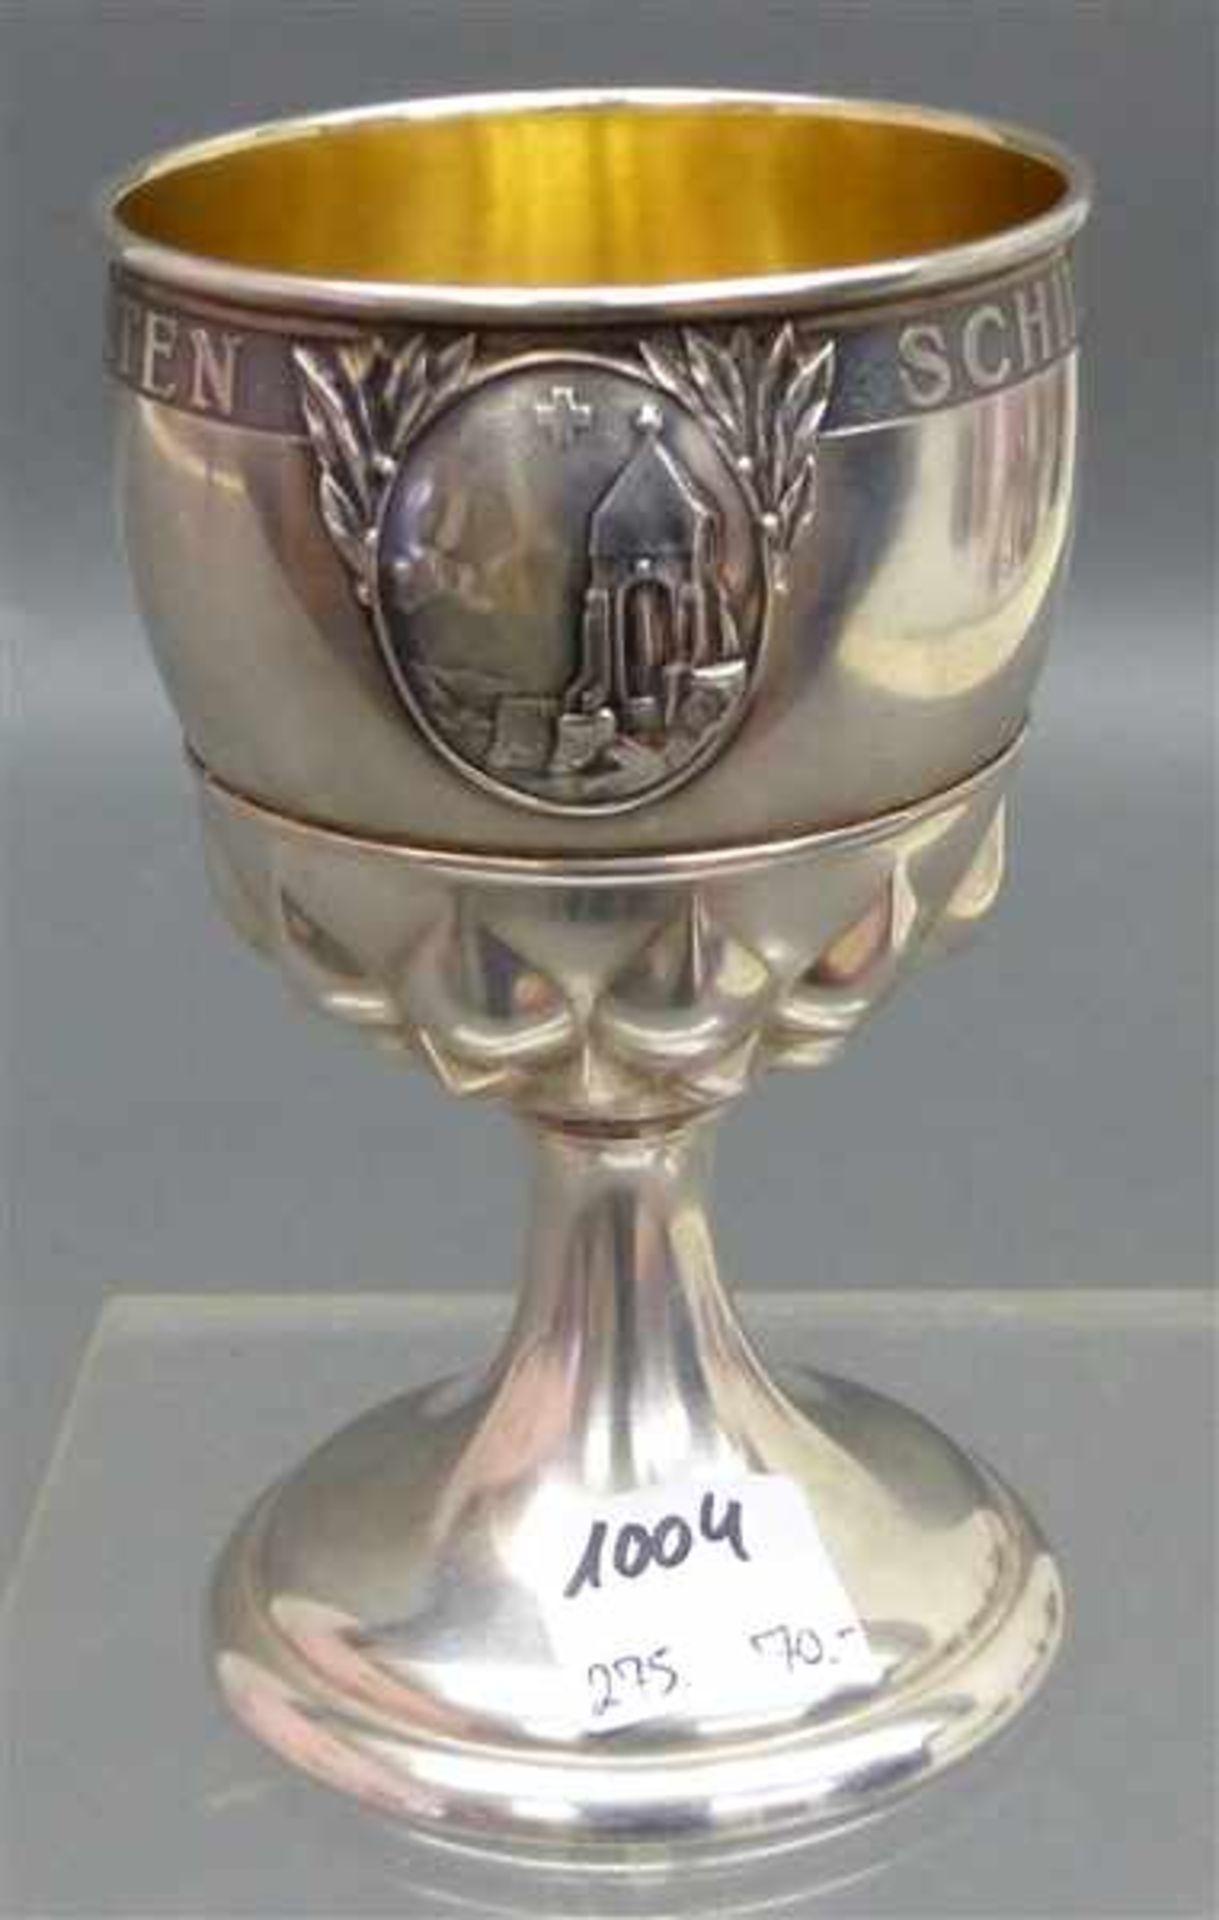 "Los 1004 - Silberpokal Innenvergoldung, graviert: ""Schiessen 1944 Morgarten"", punziert, h 11 cm, 134 g schwer,"